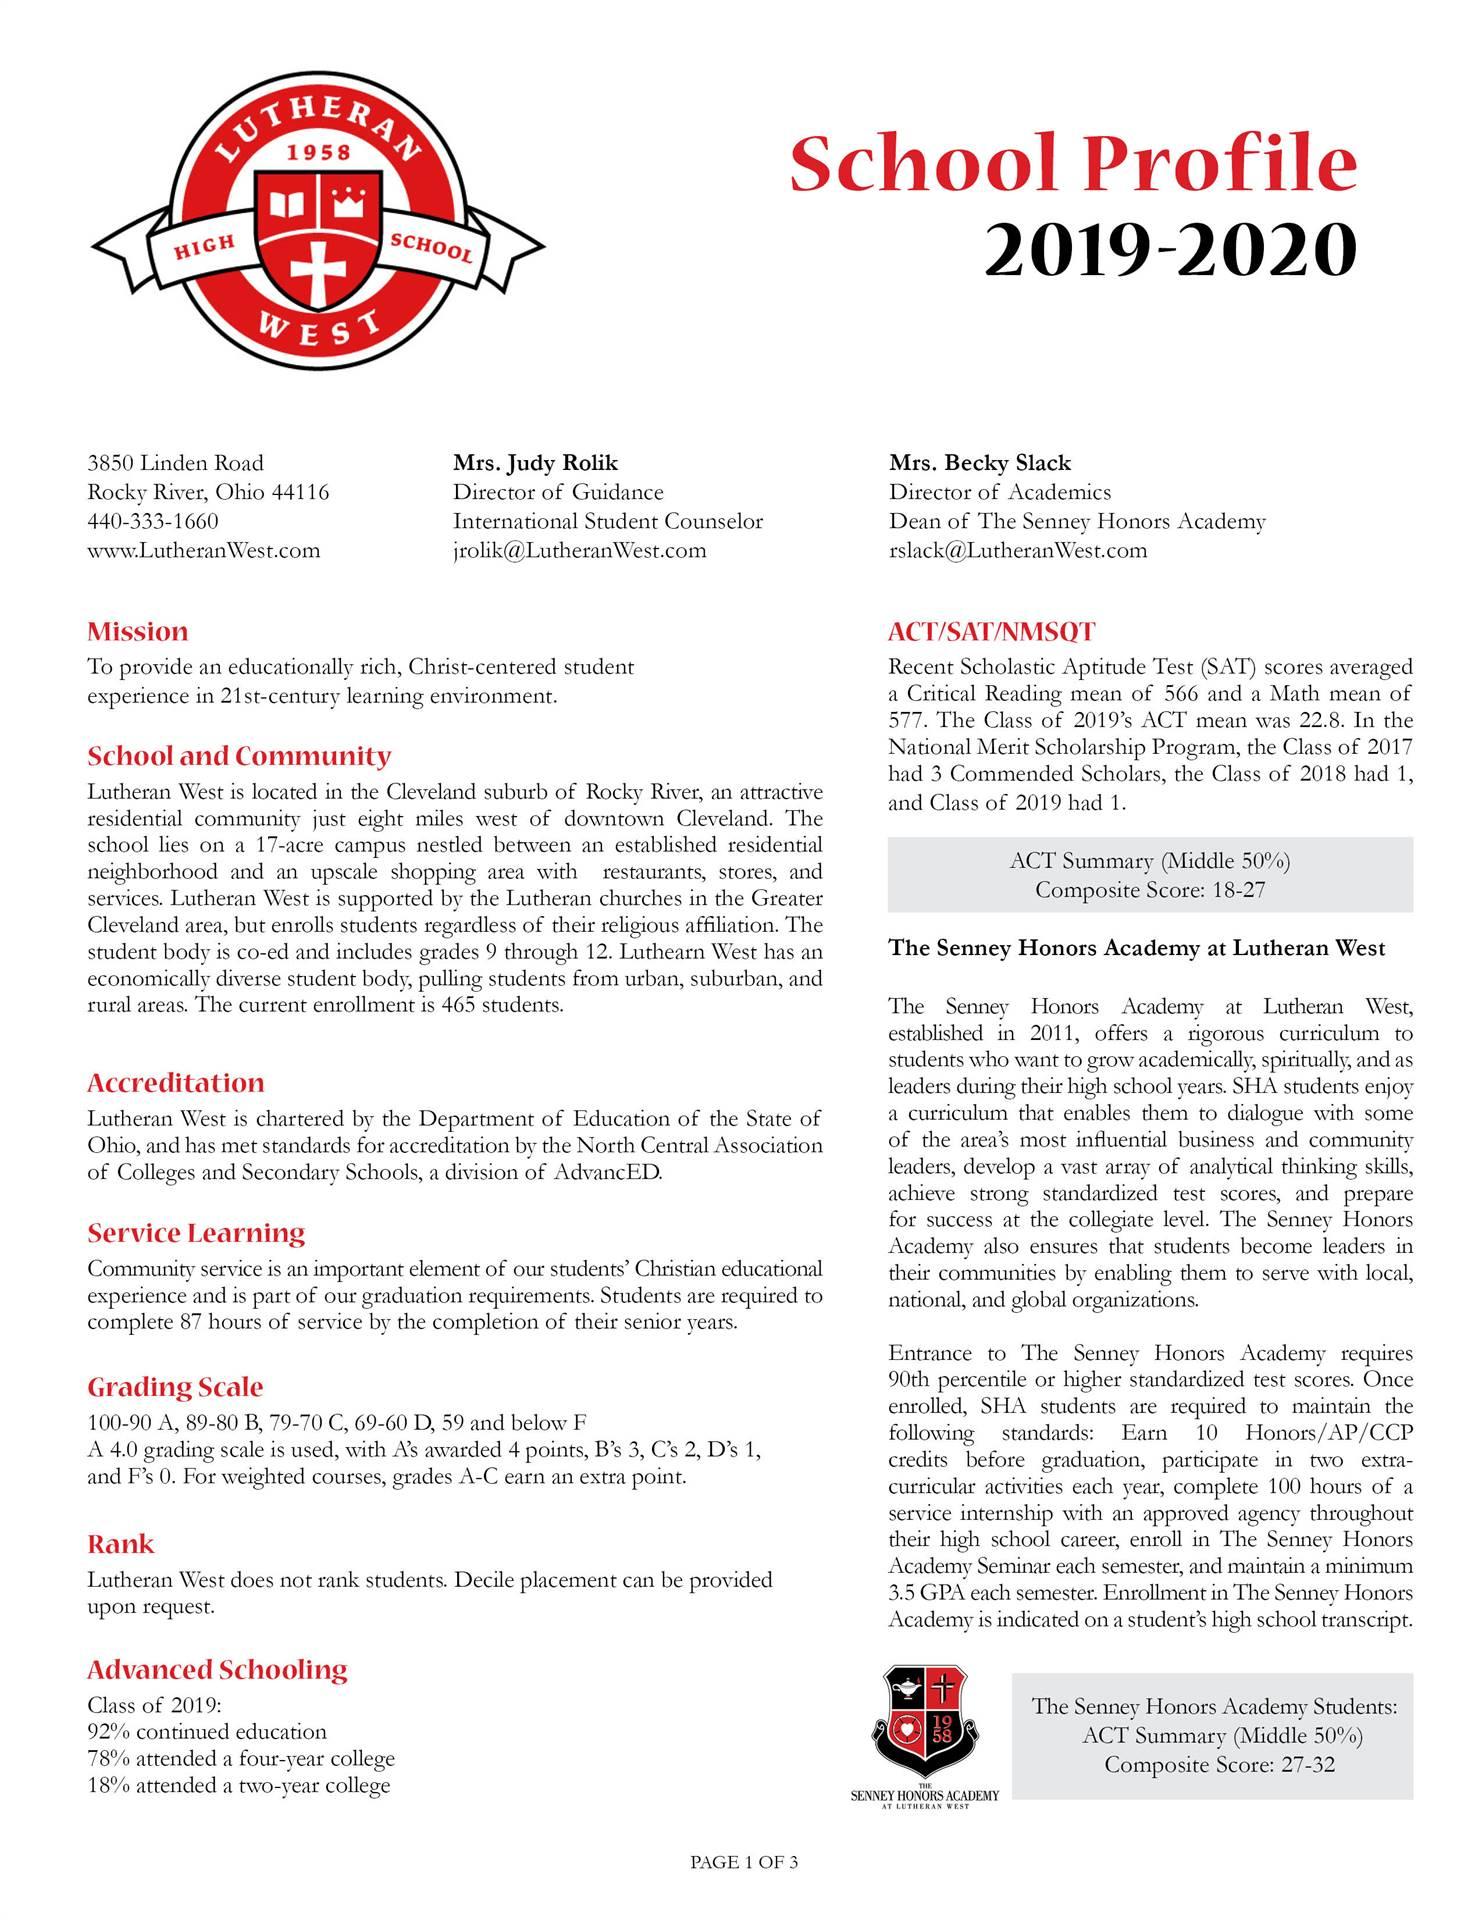 School-Profile-Page1